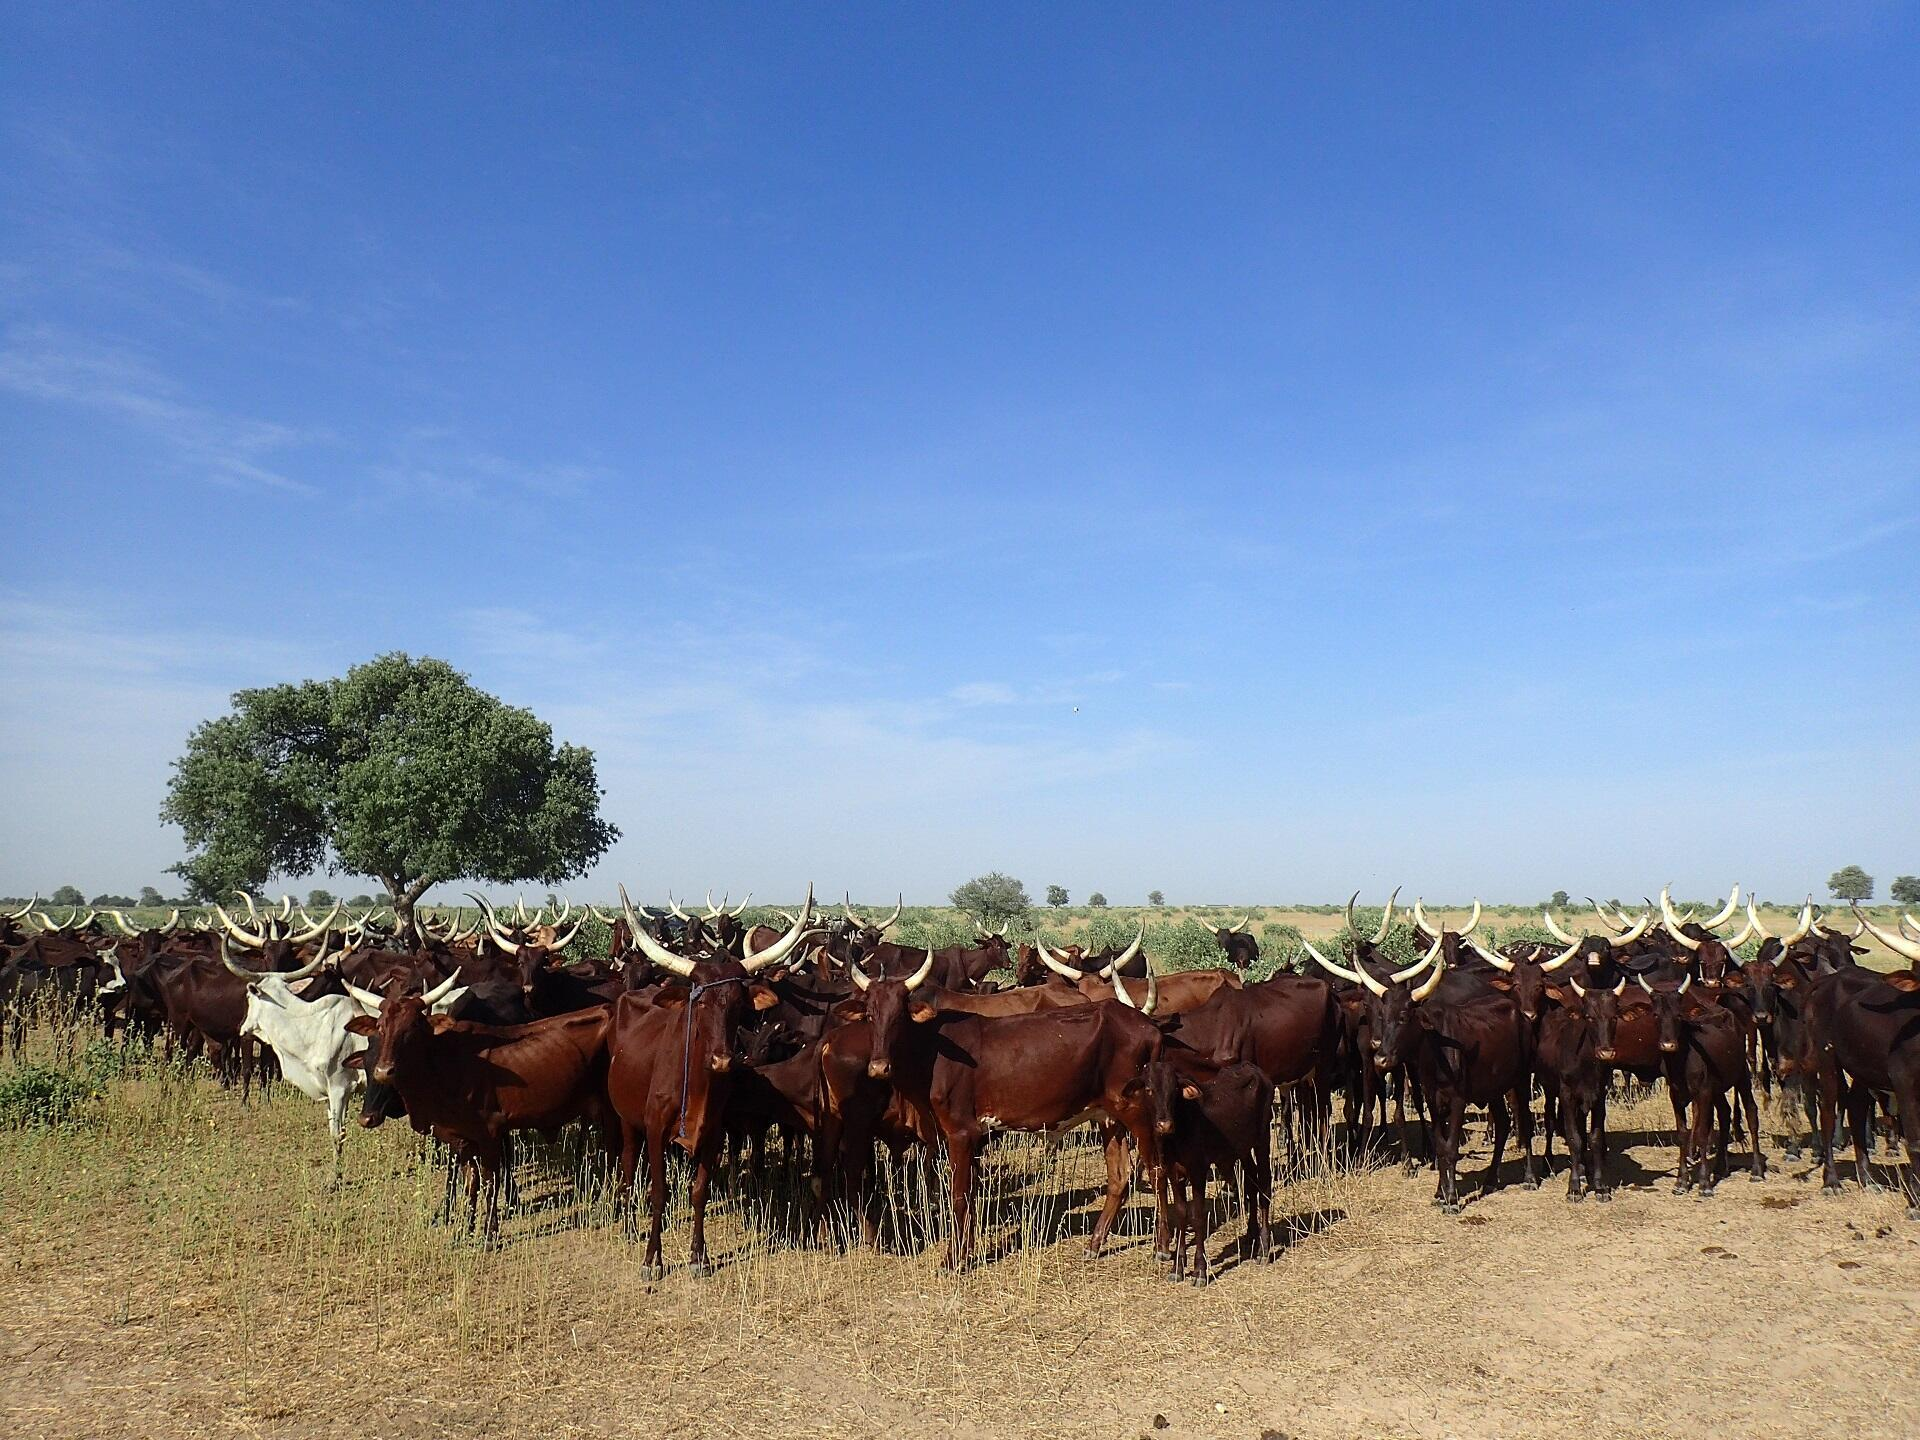 Le troupeau en transhumance